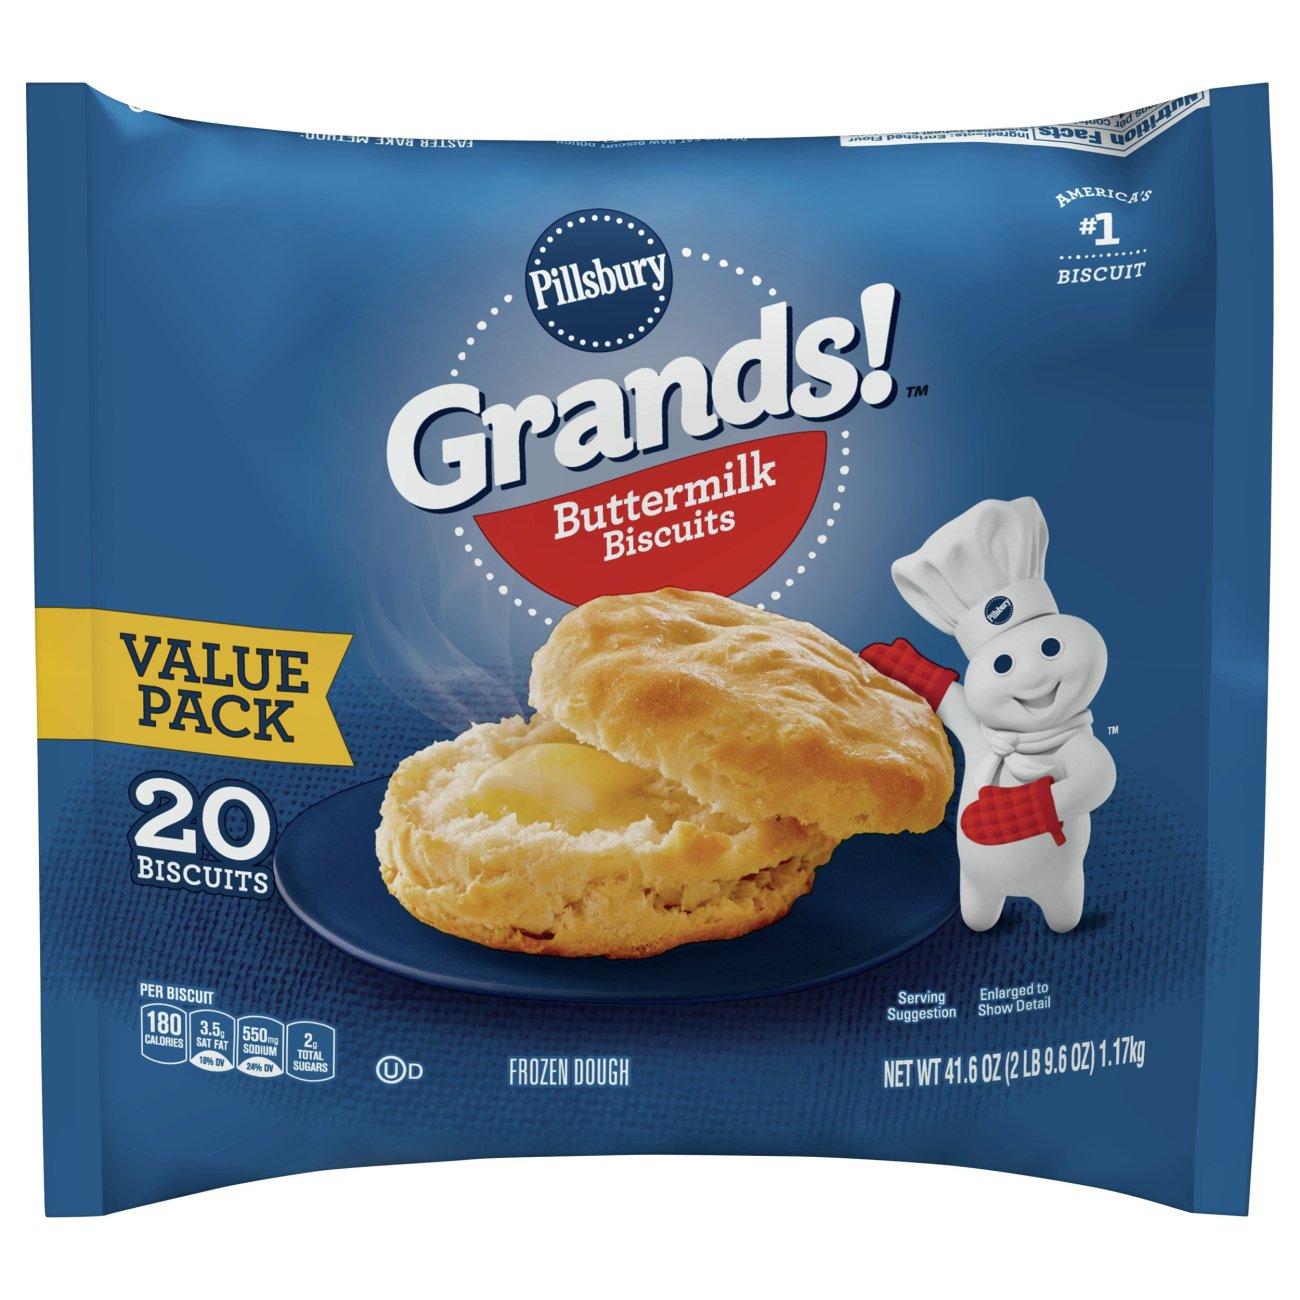 Pillsbury Grands Buttermilk Biscuits Shop Biscuits At Heb